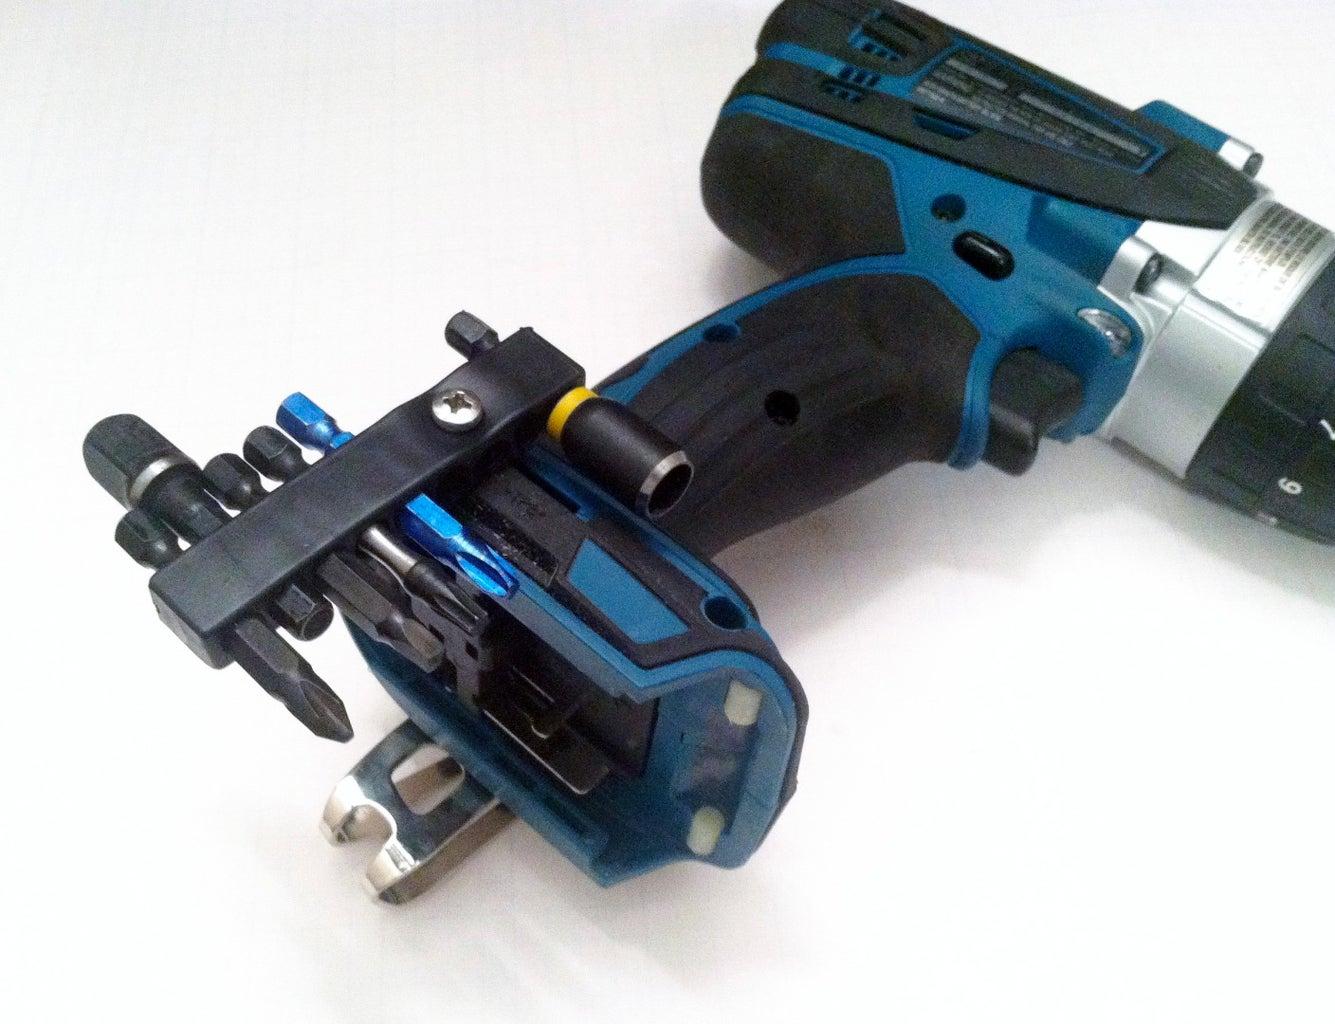 Bit Magazine for a Blue Drill